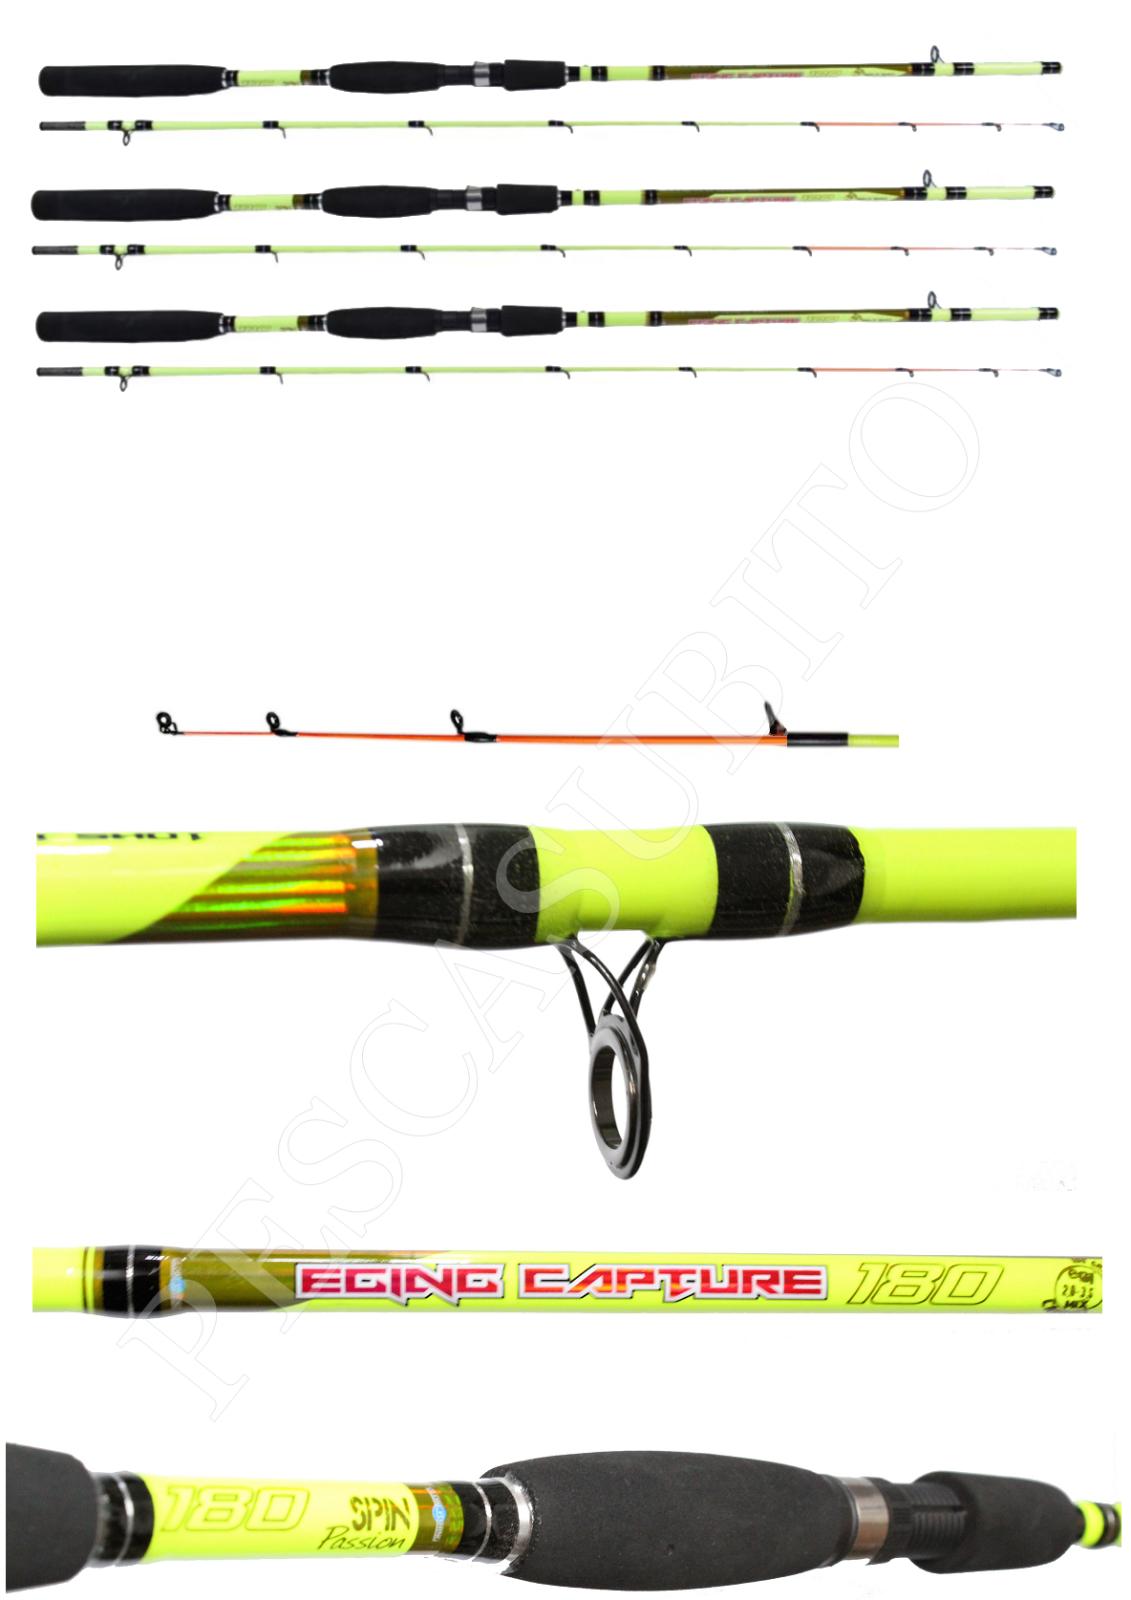 Kit 3 Canne Pesca Eging 1,80Mt Seppia Calamaro Seppie Calamari Barca Riva